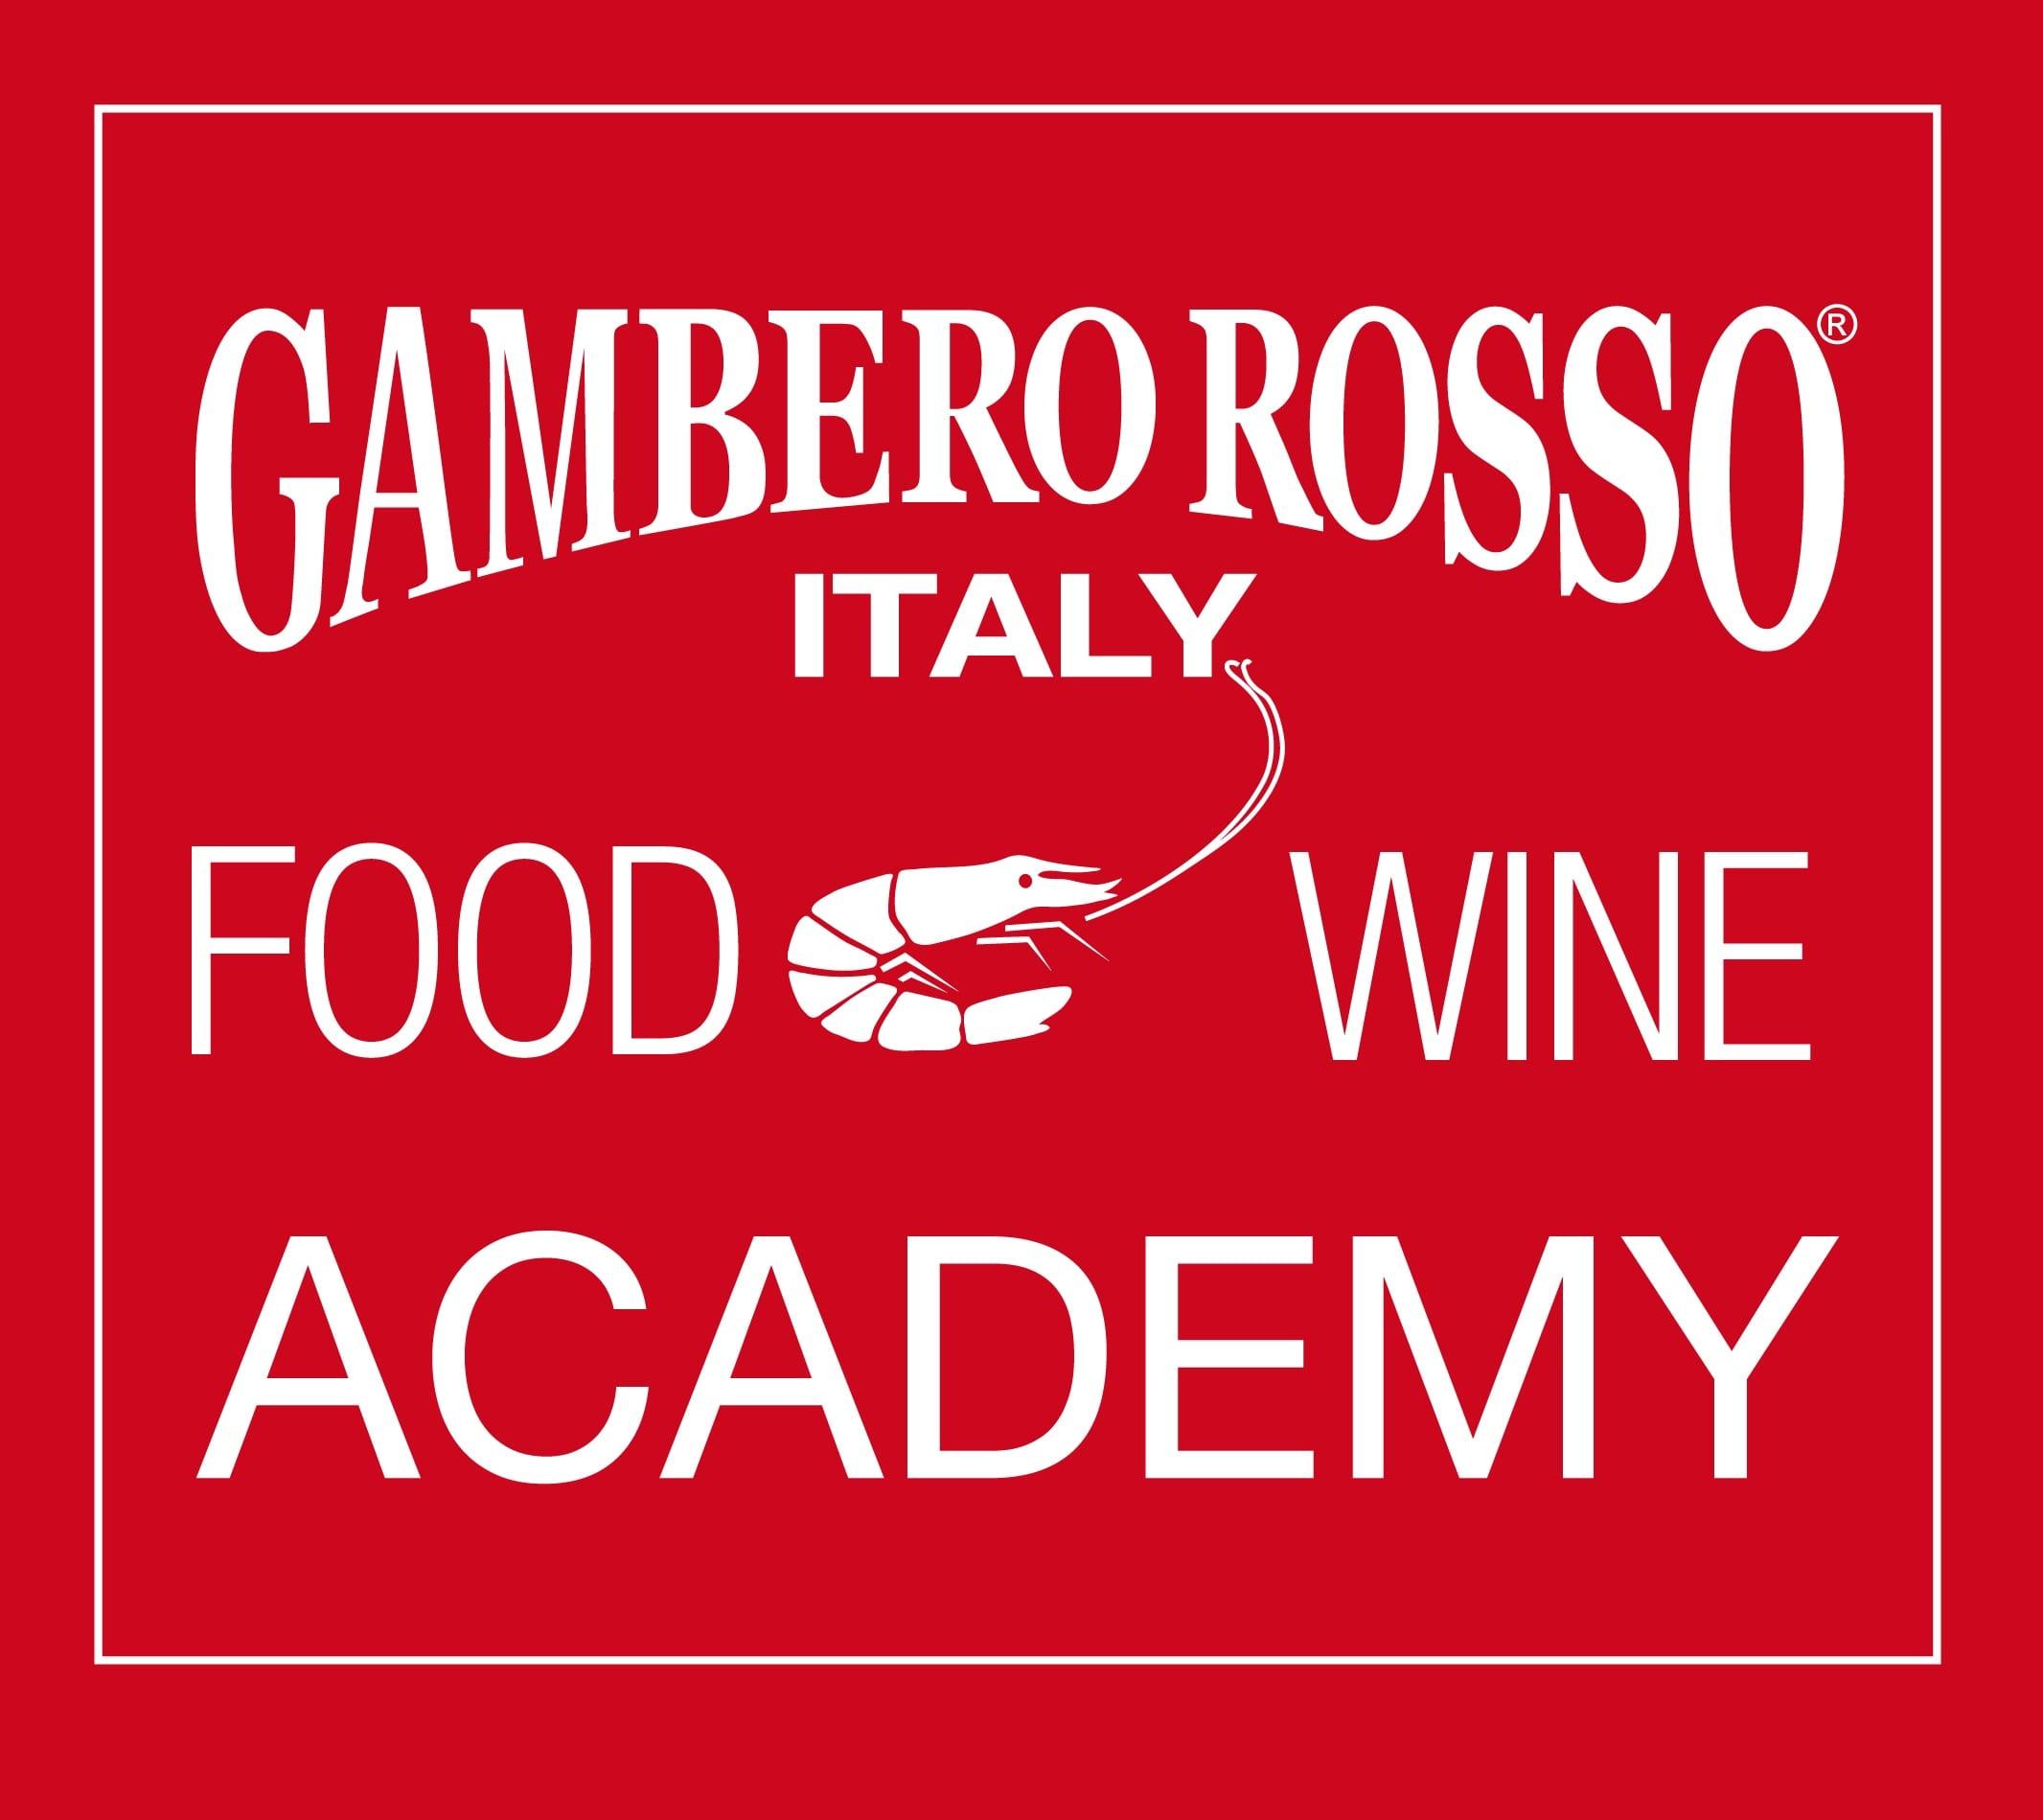 Gambero rosso academy logo